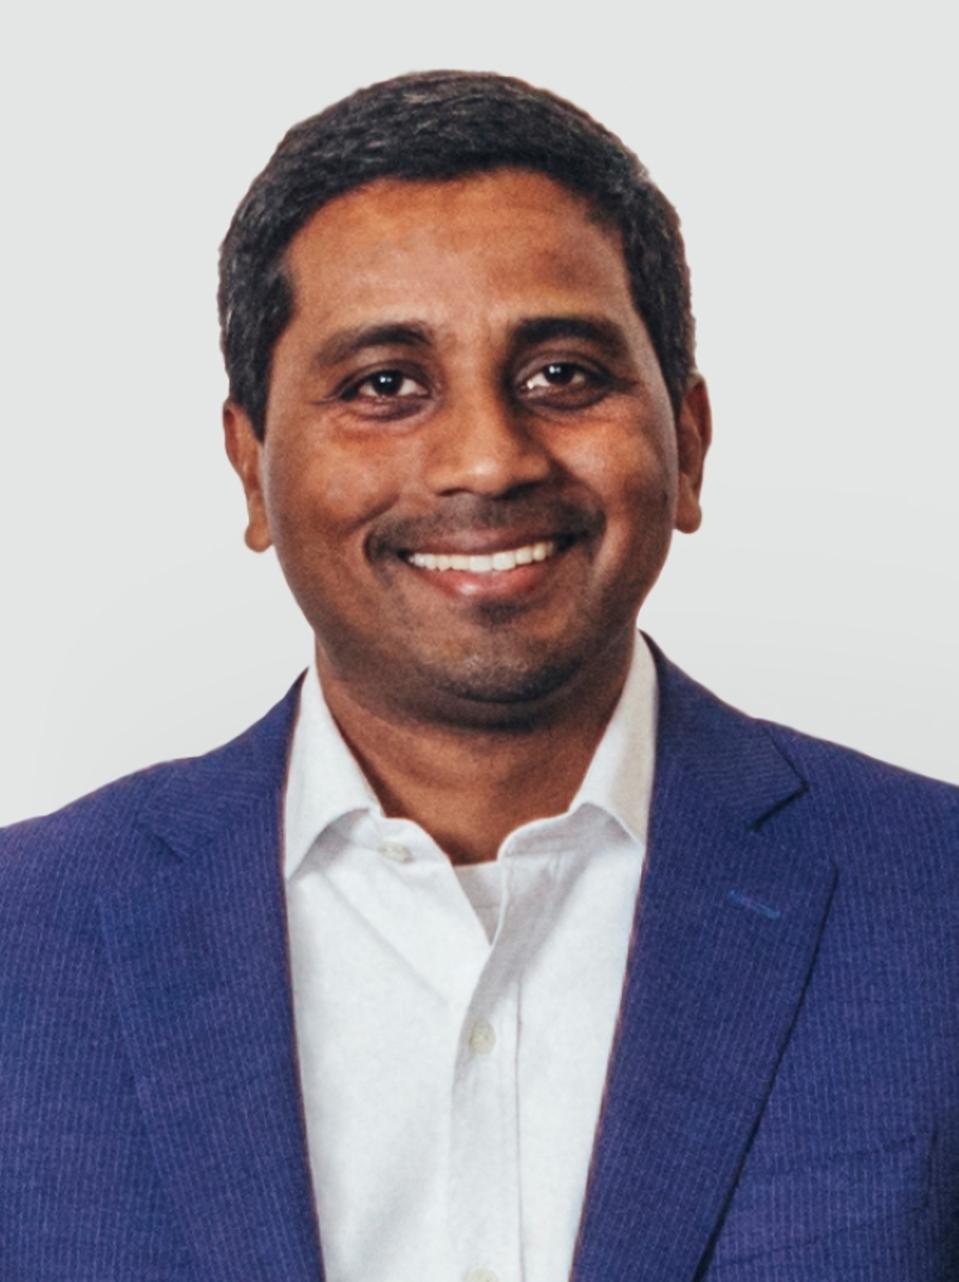 Nigel Vaz, CEO of Publicis Sapient.